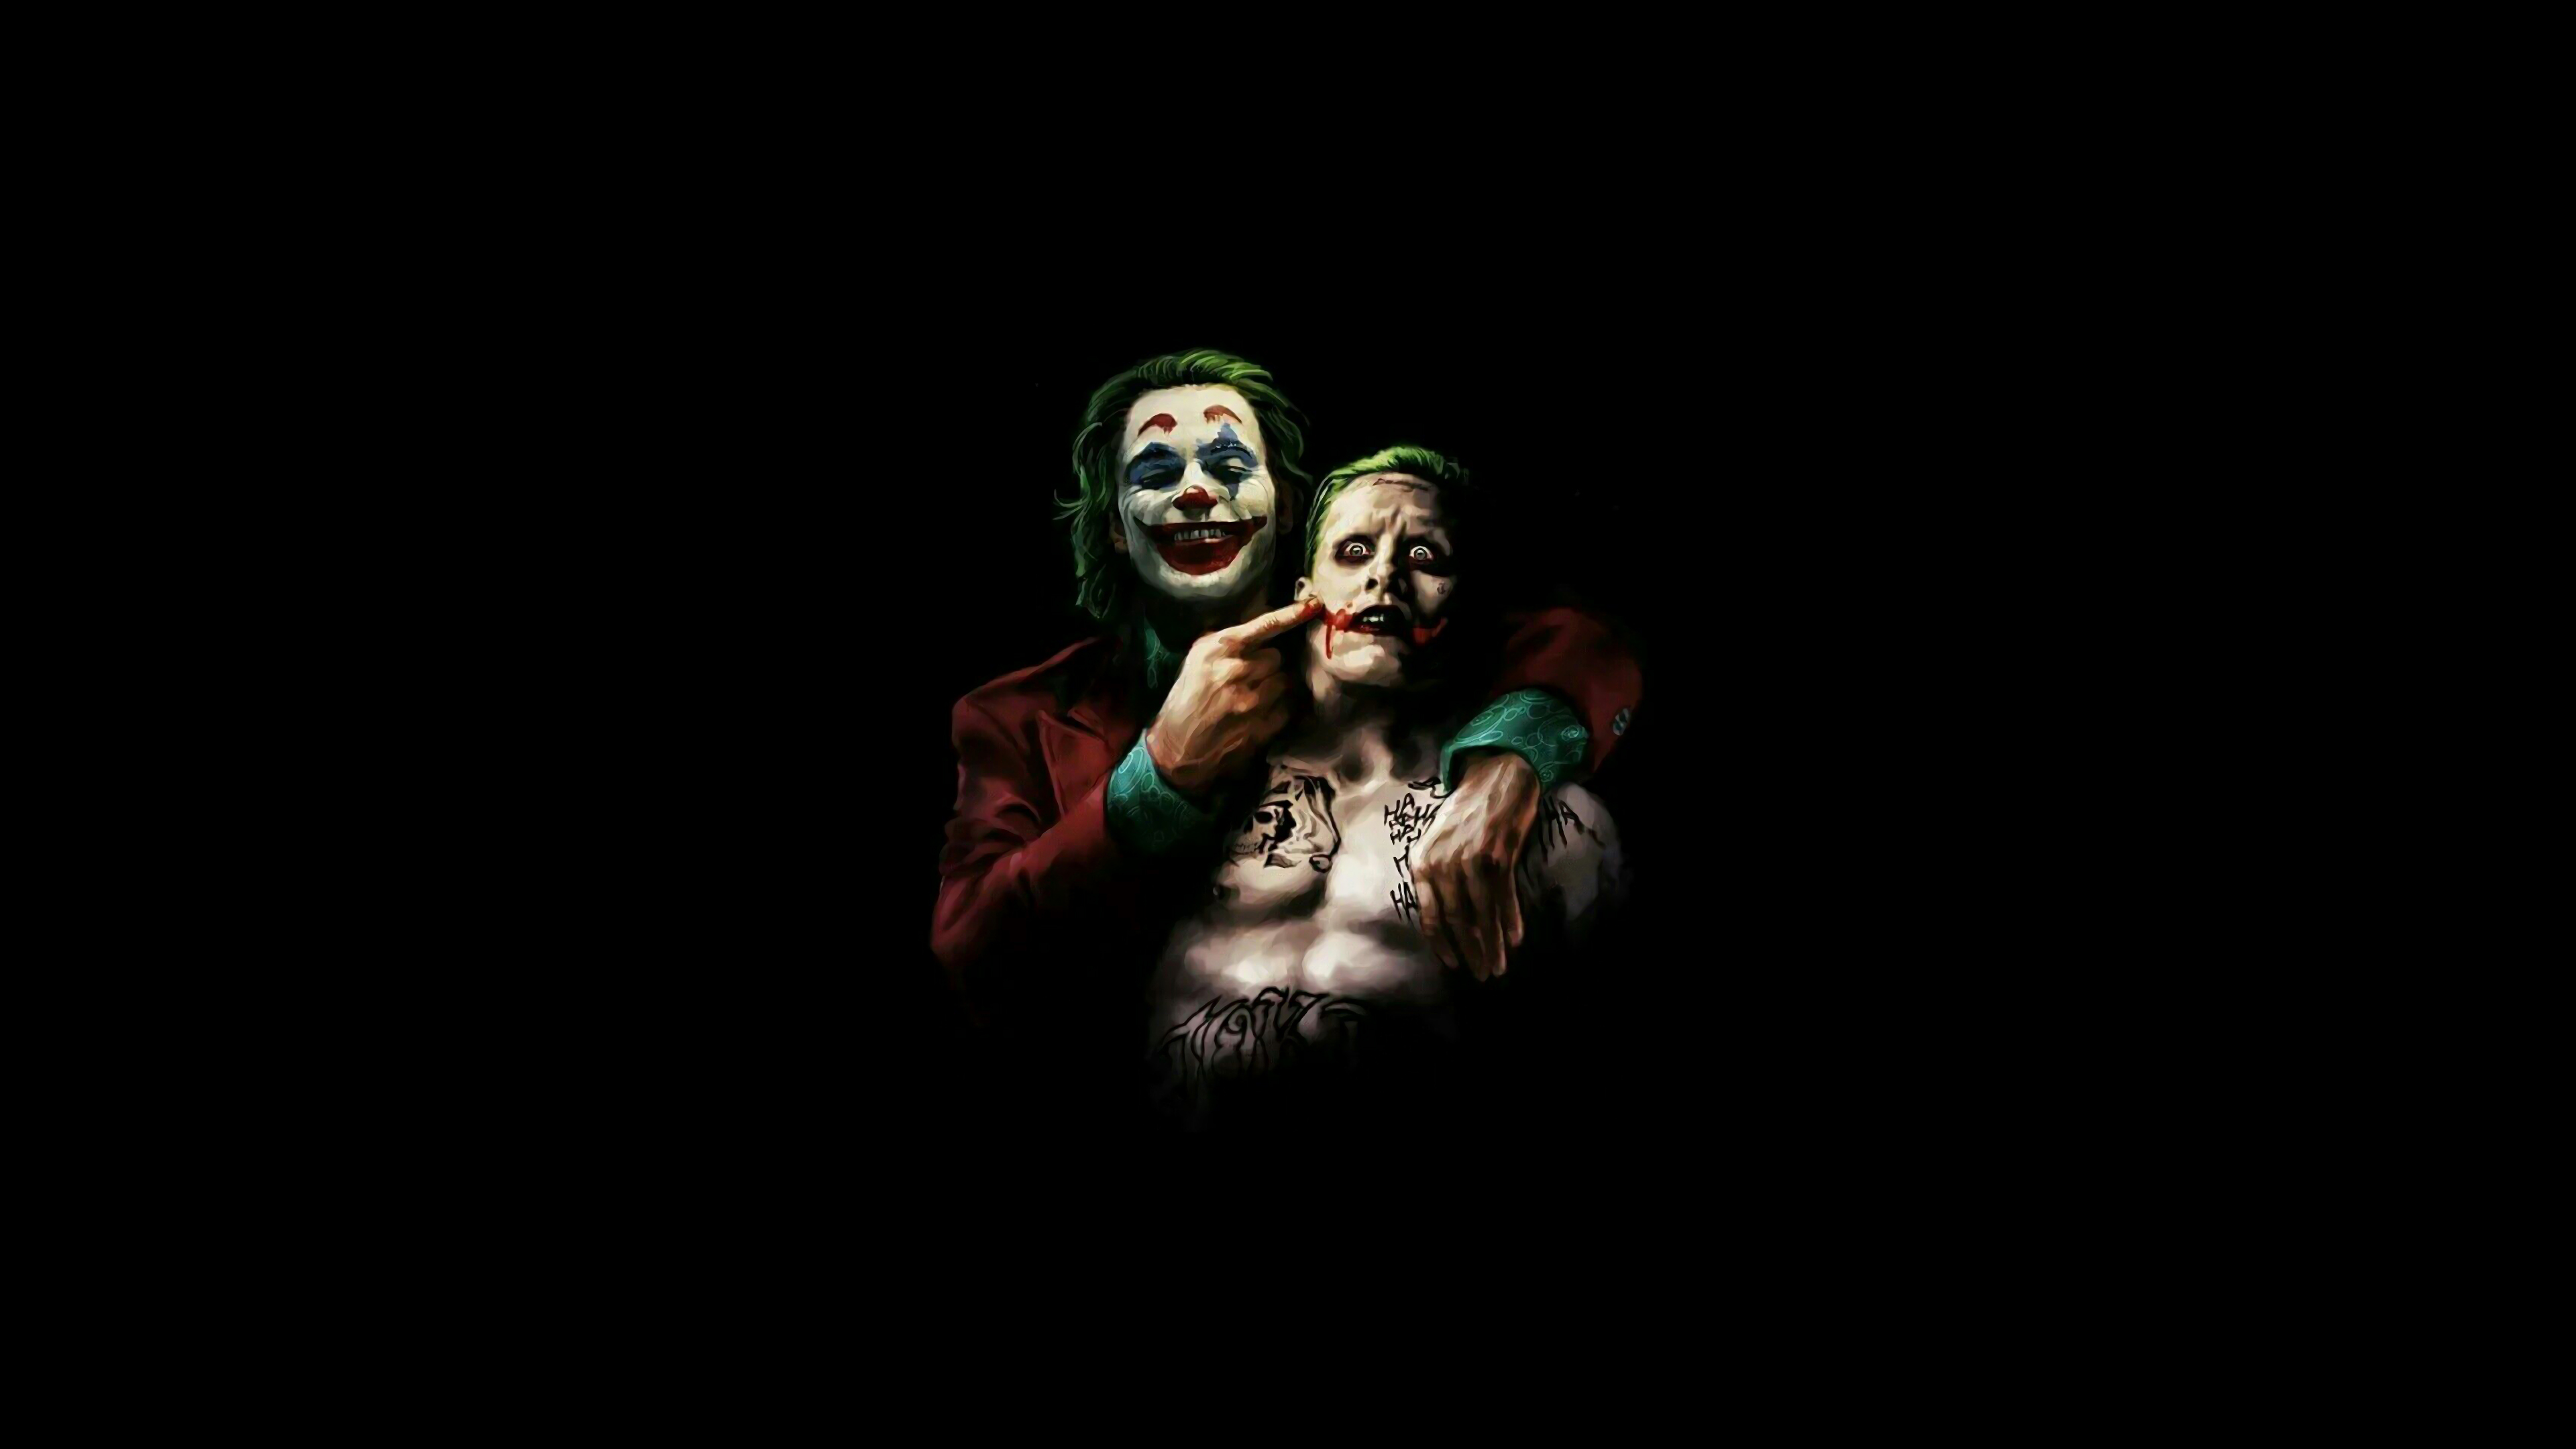 Joaquin Phoenix And Jared Leto As Joker 4k Hd Superheroes